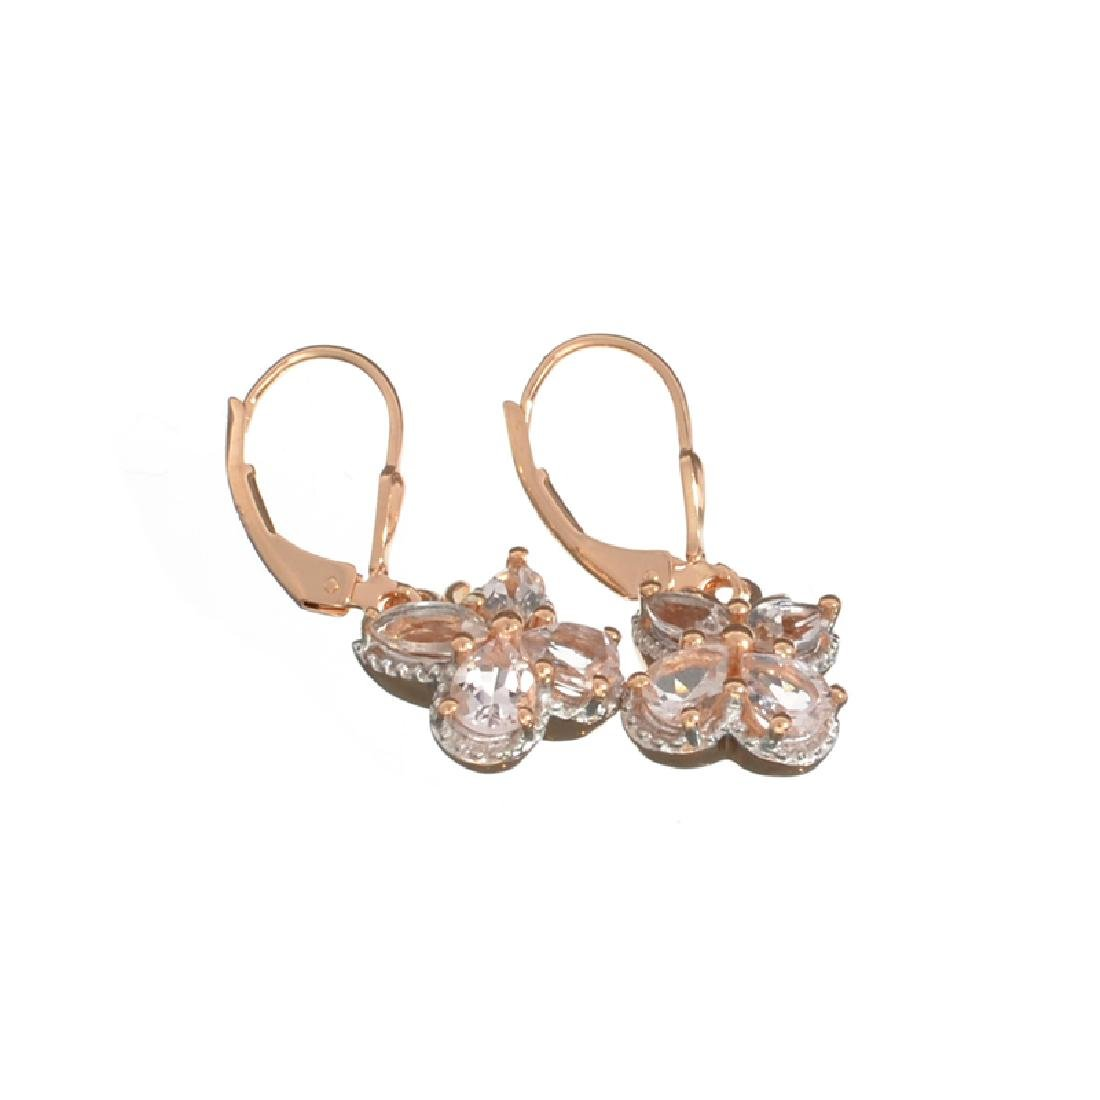 Fine Jewelry 1.88CT Oval/Matquise Cut Morganite Over